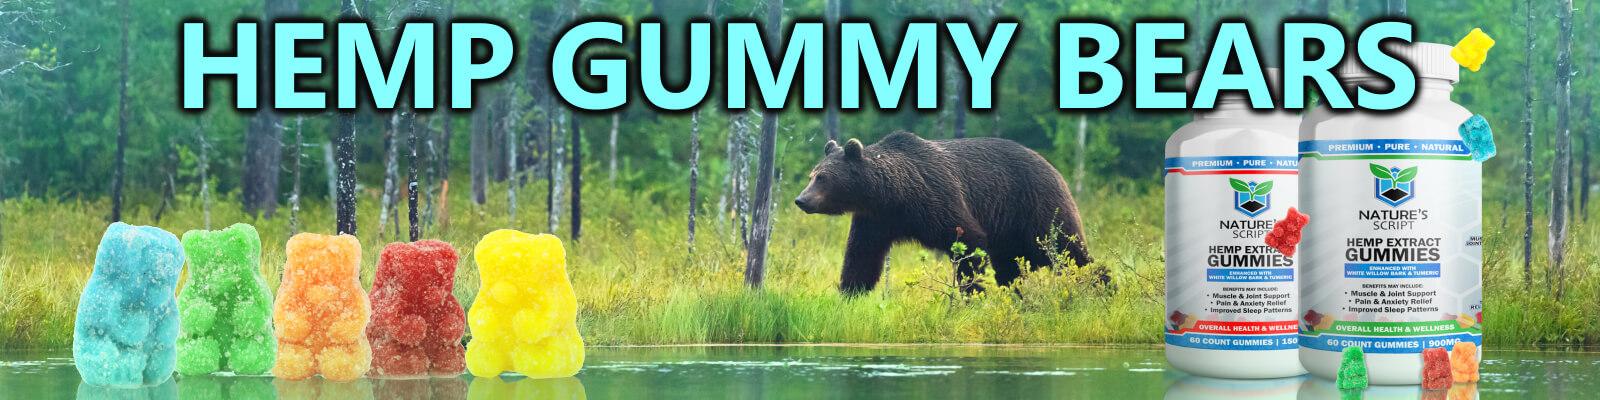 black bear walking in forest hemp gummy bears banner